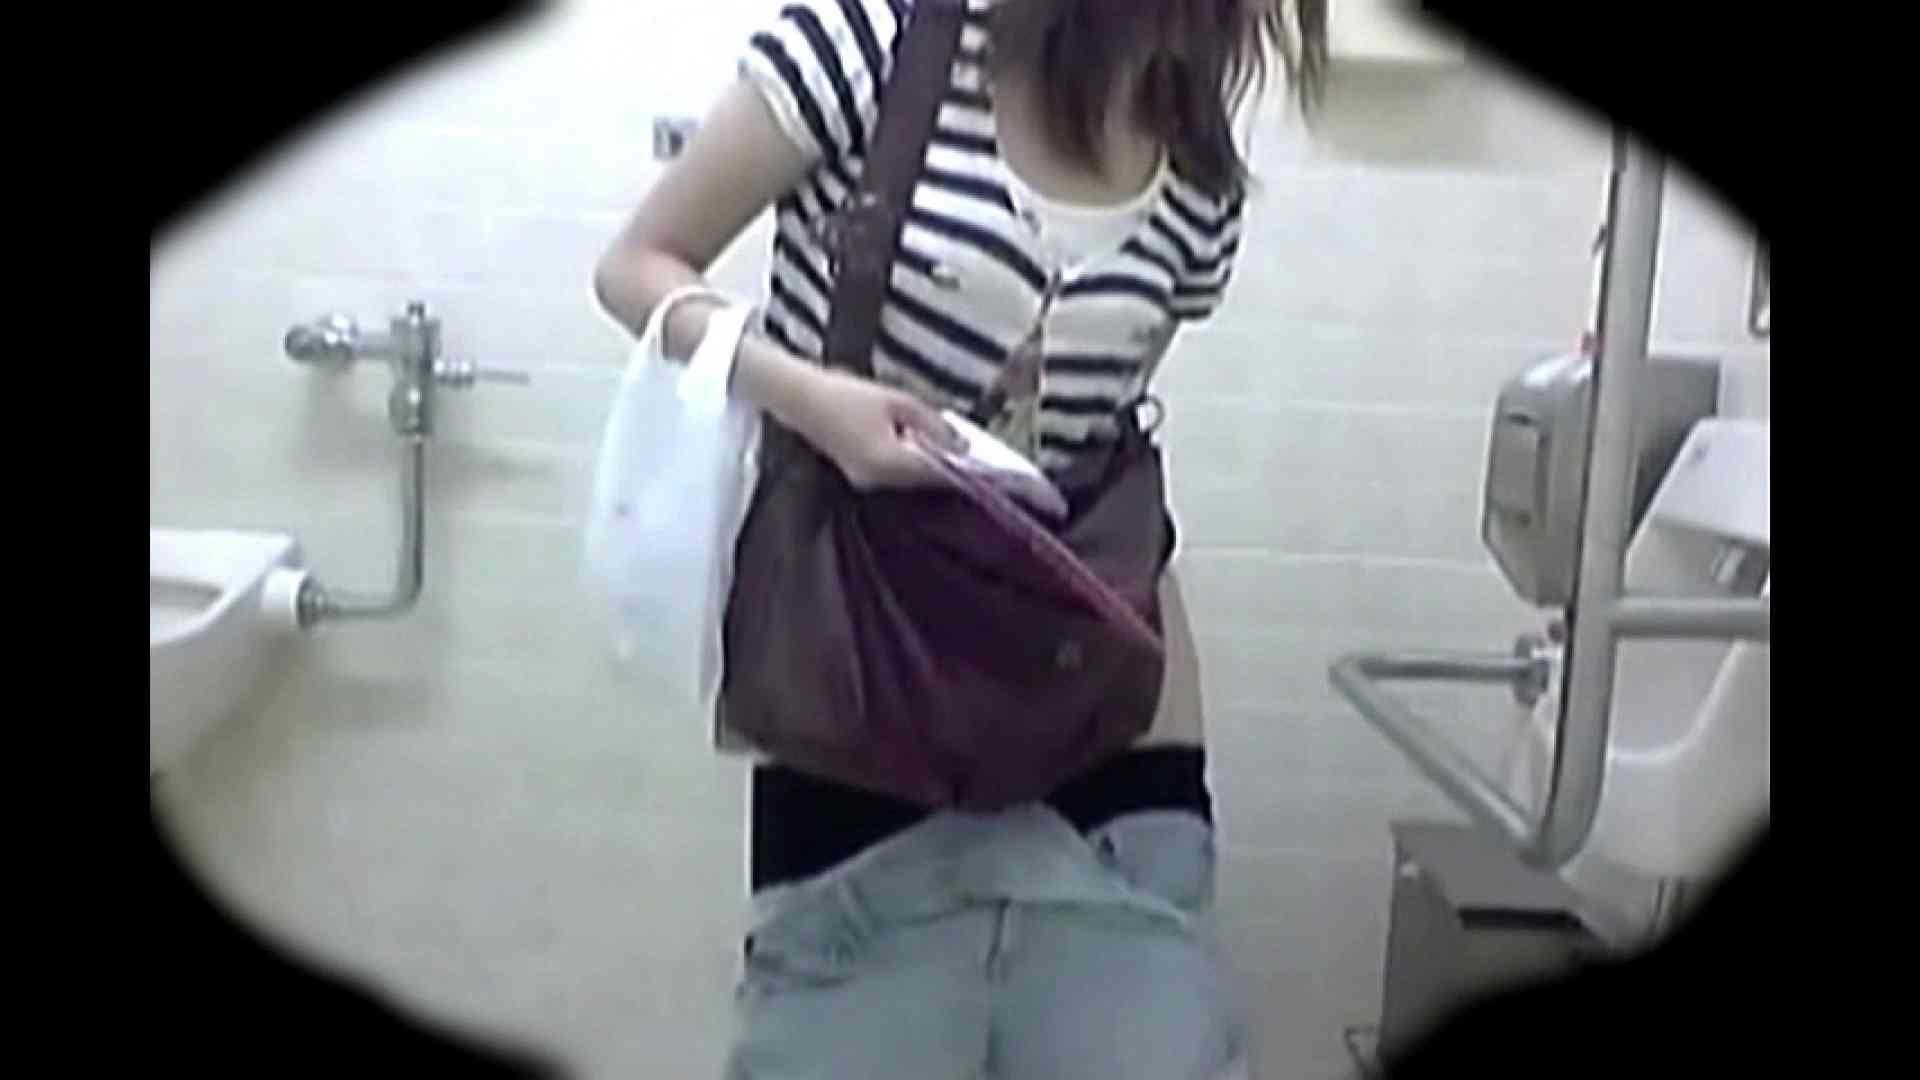 teen galトイレ覗き紙がナイ編‼vol.06 OLのエロ生活 | トイレ  82連発 61